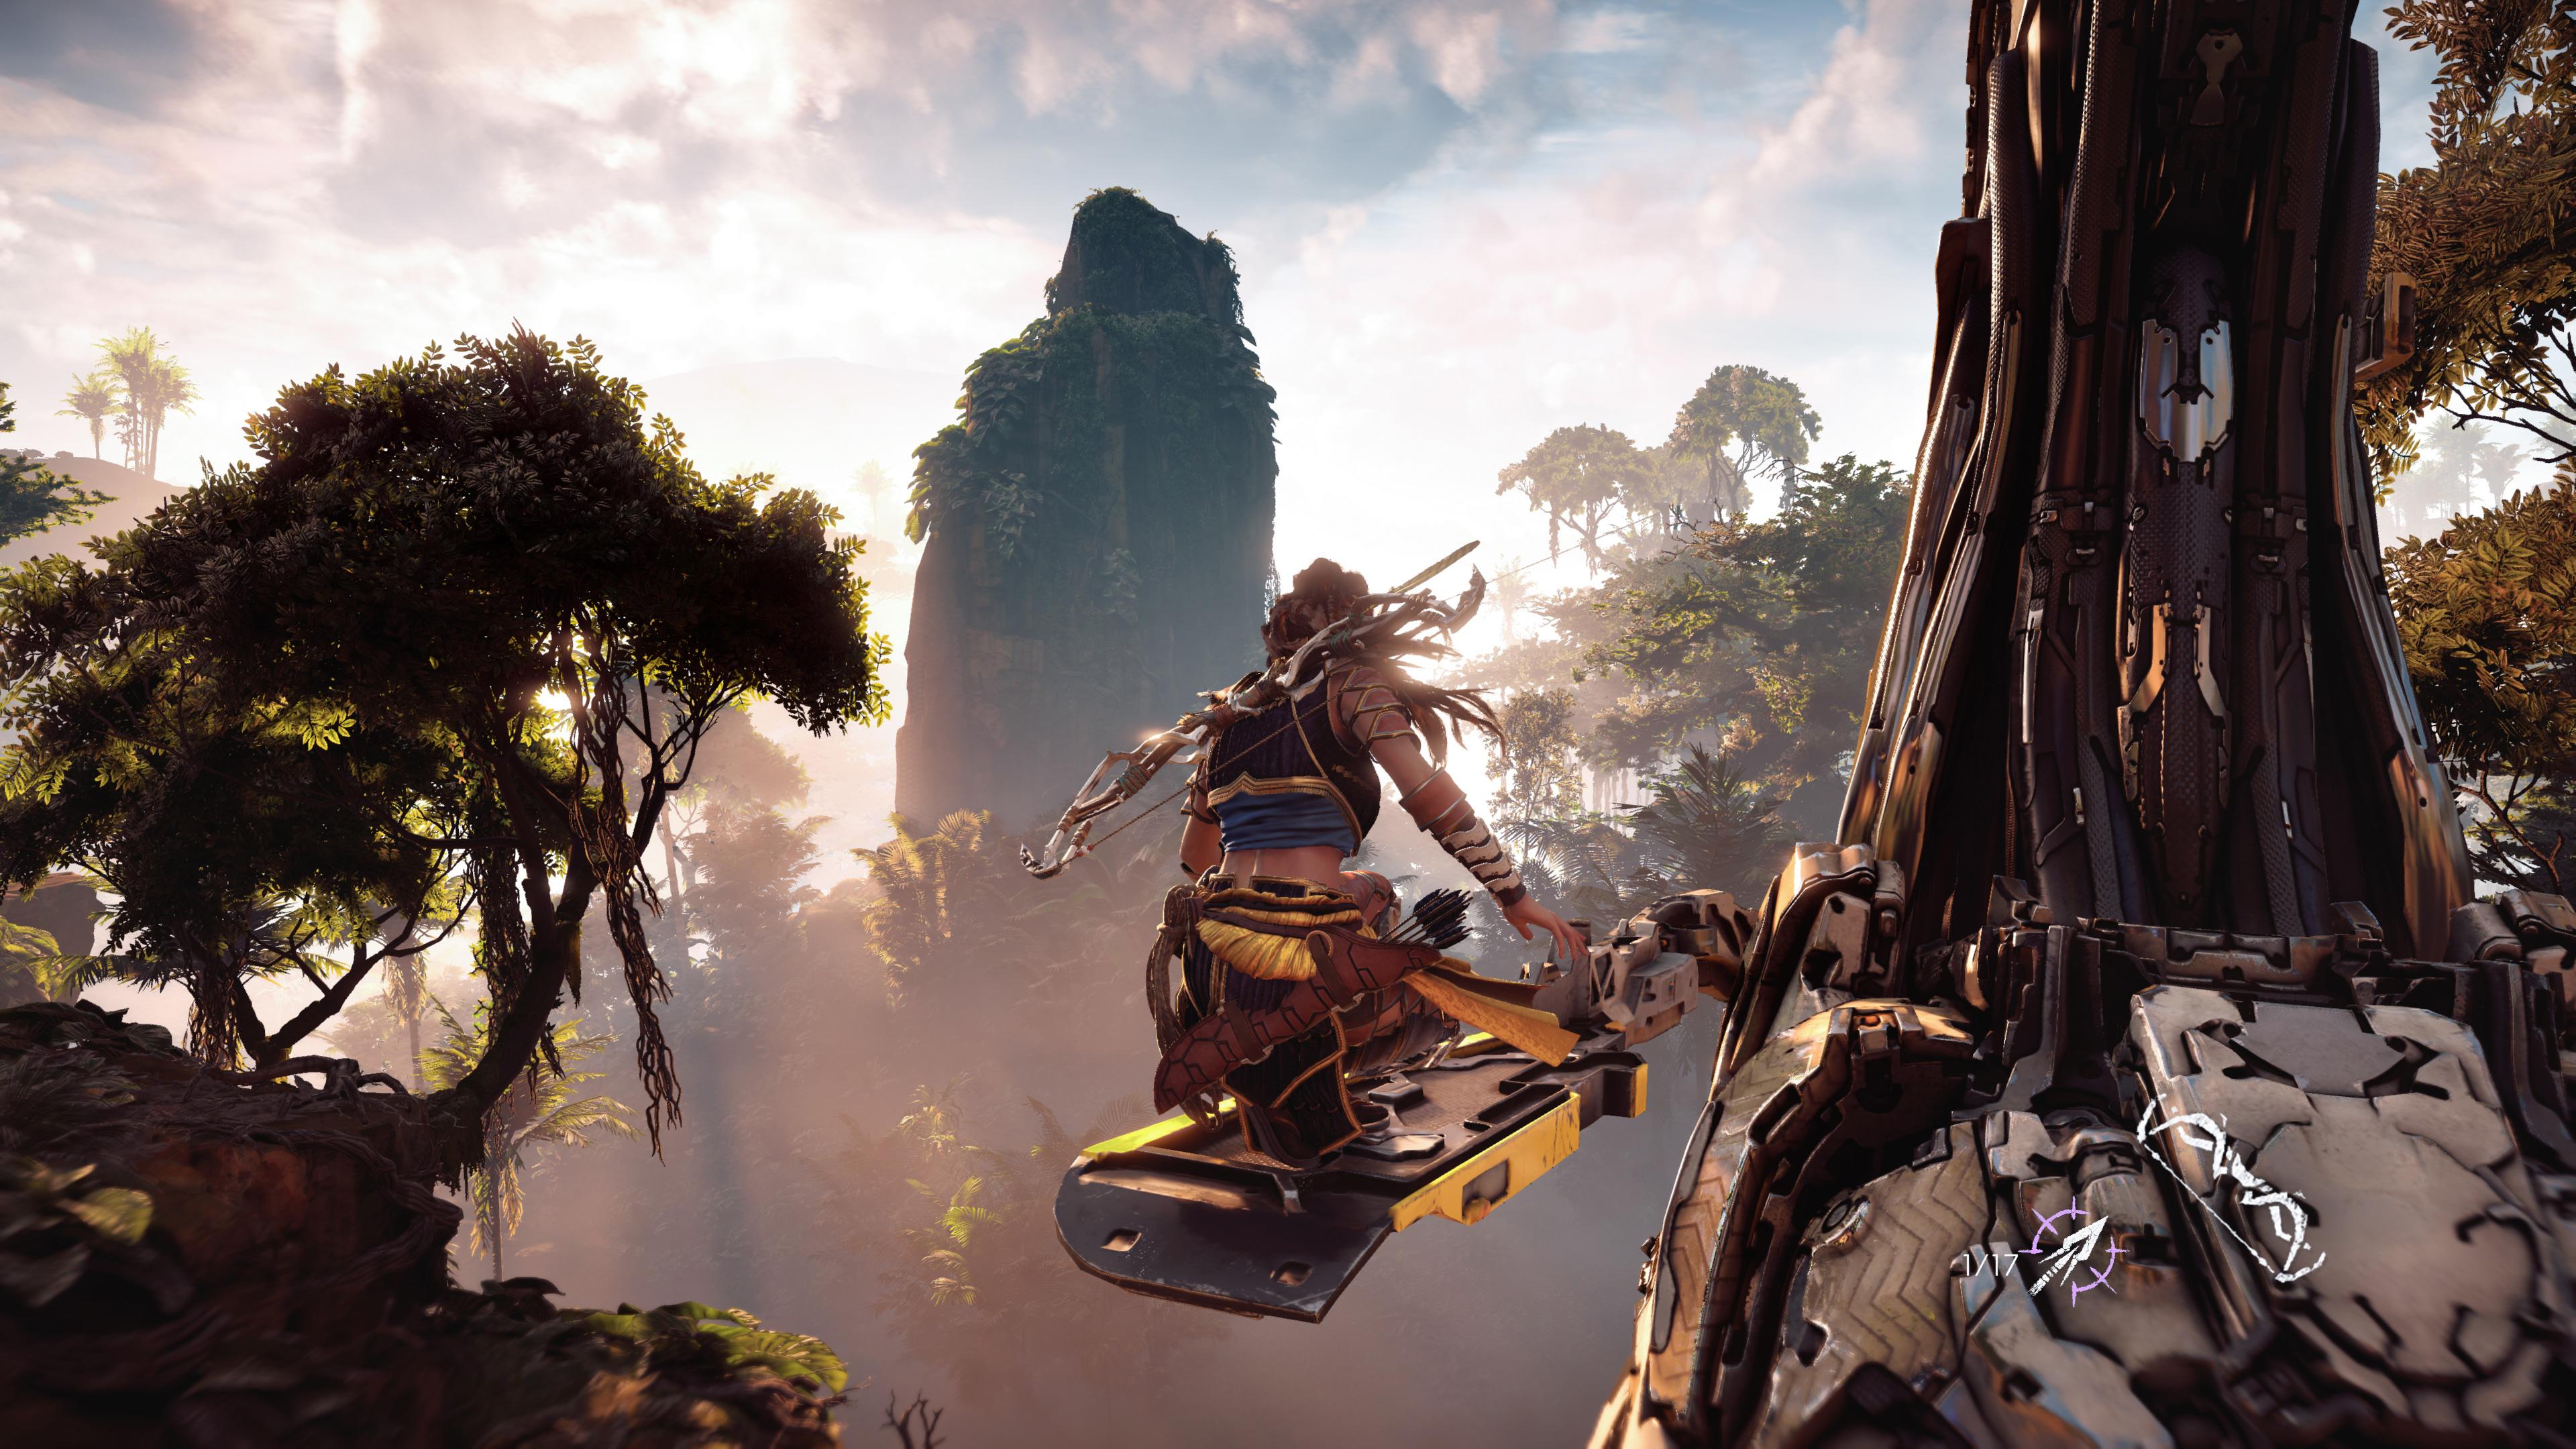 2017 Horizon Zero Dawn Hd Games 4k Wallpapers Images